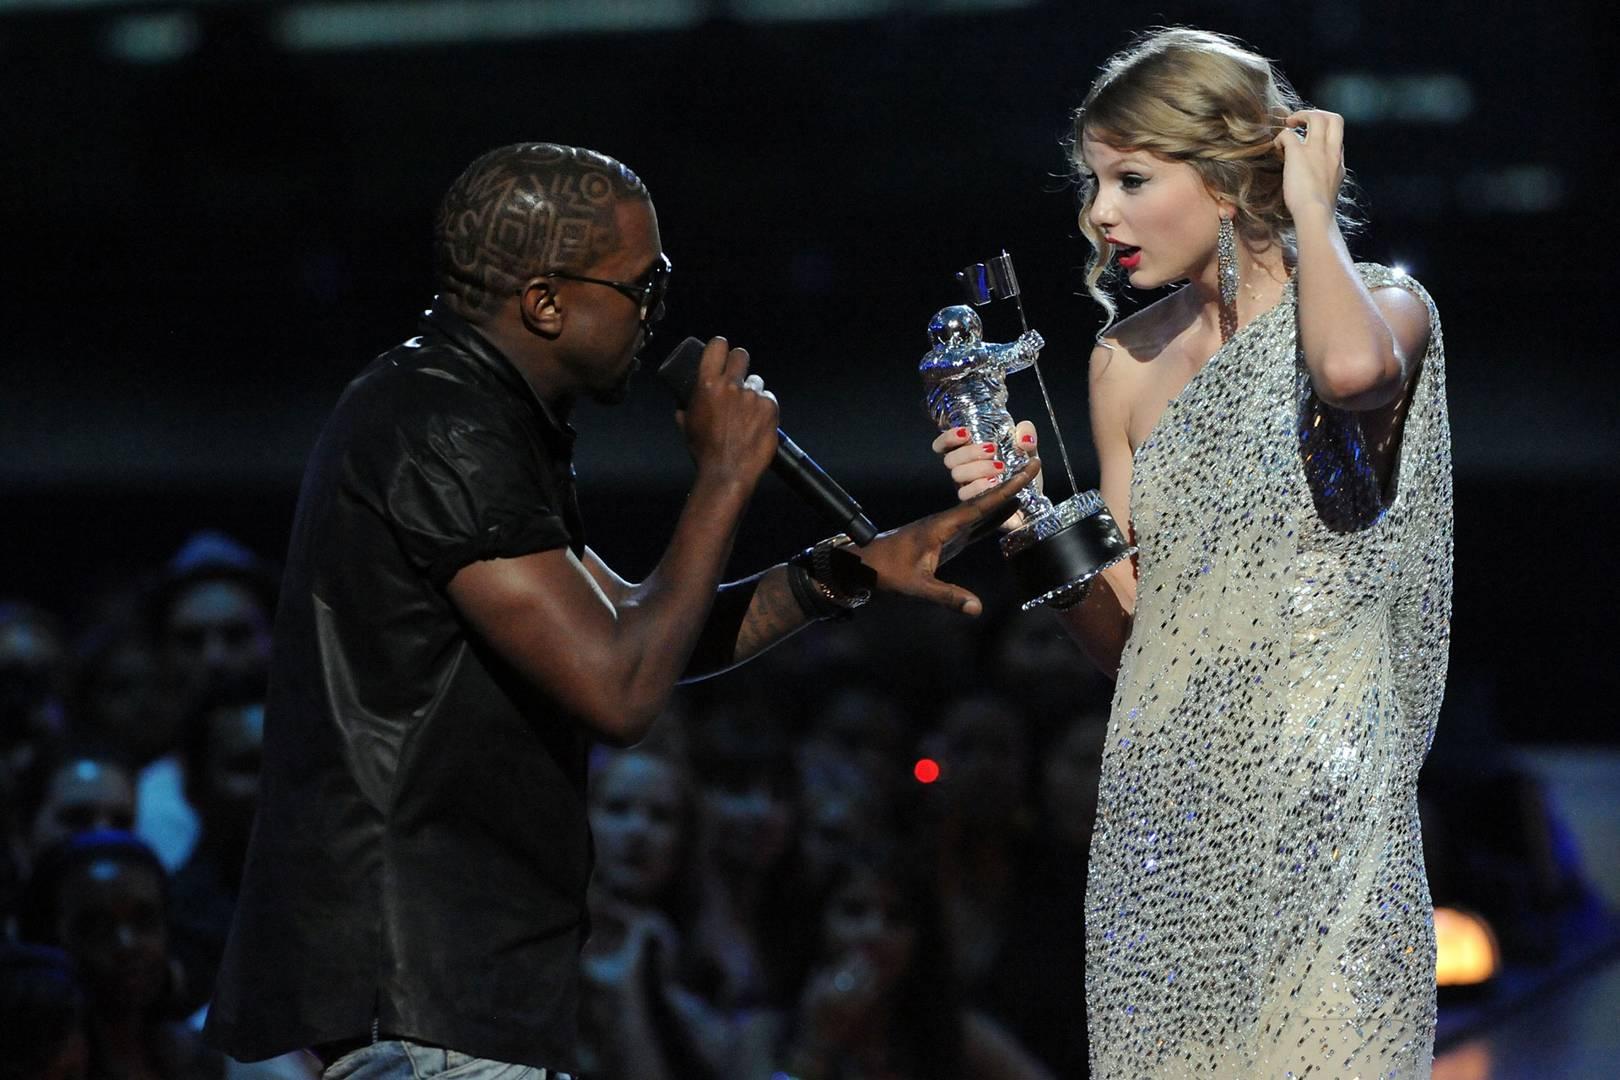 Leaked Audio Catches Kanye West Calling Taylor Swift a Horrible Name Leaked Audio Catches Kanye West Calling Taylor Swift a Horrible Name new pictures